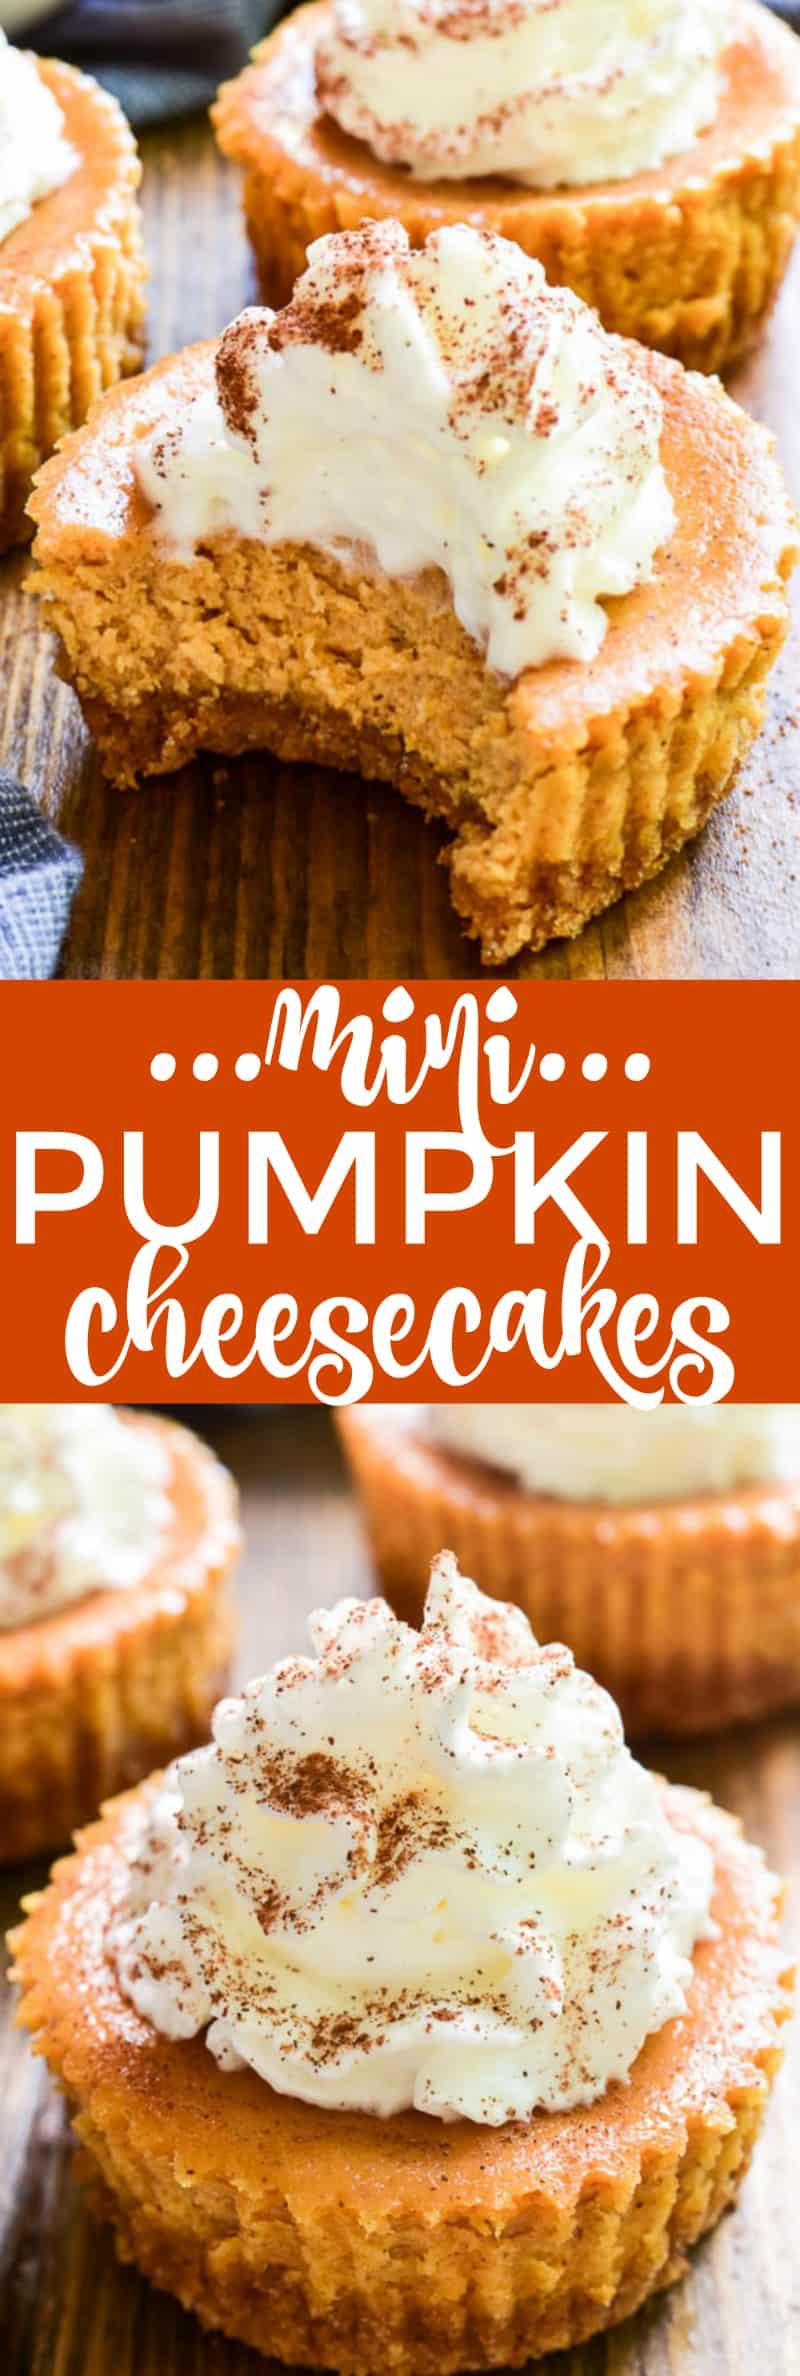 Mini Pumpkin Cheesecakes with Cinnamon Whipped CreamWhat2Cook  |Mini Pumpkin Cheesecake Bites